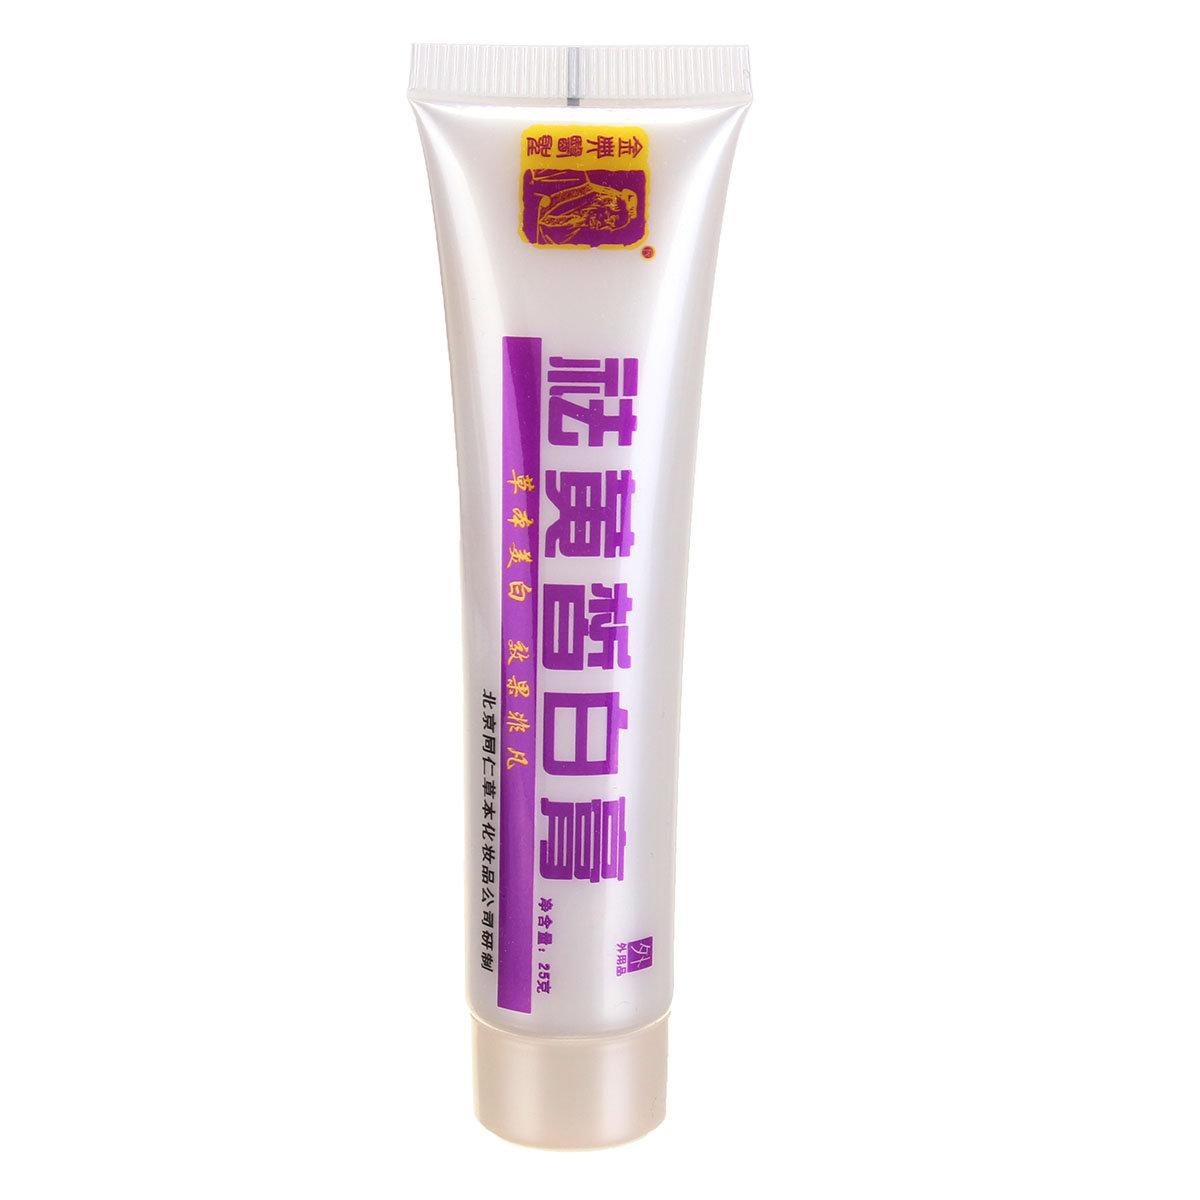 Face Whitening Cream Yellowish Melanin Acne Spot RemoveImprove Skin Color